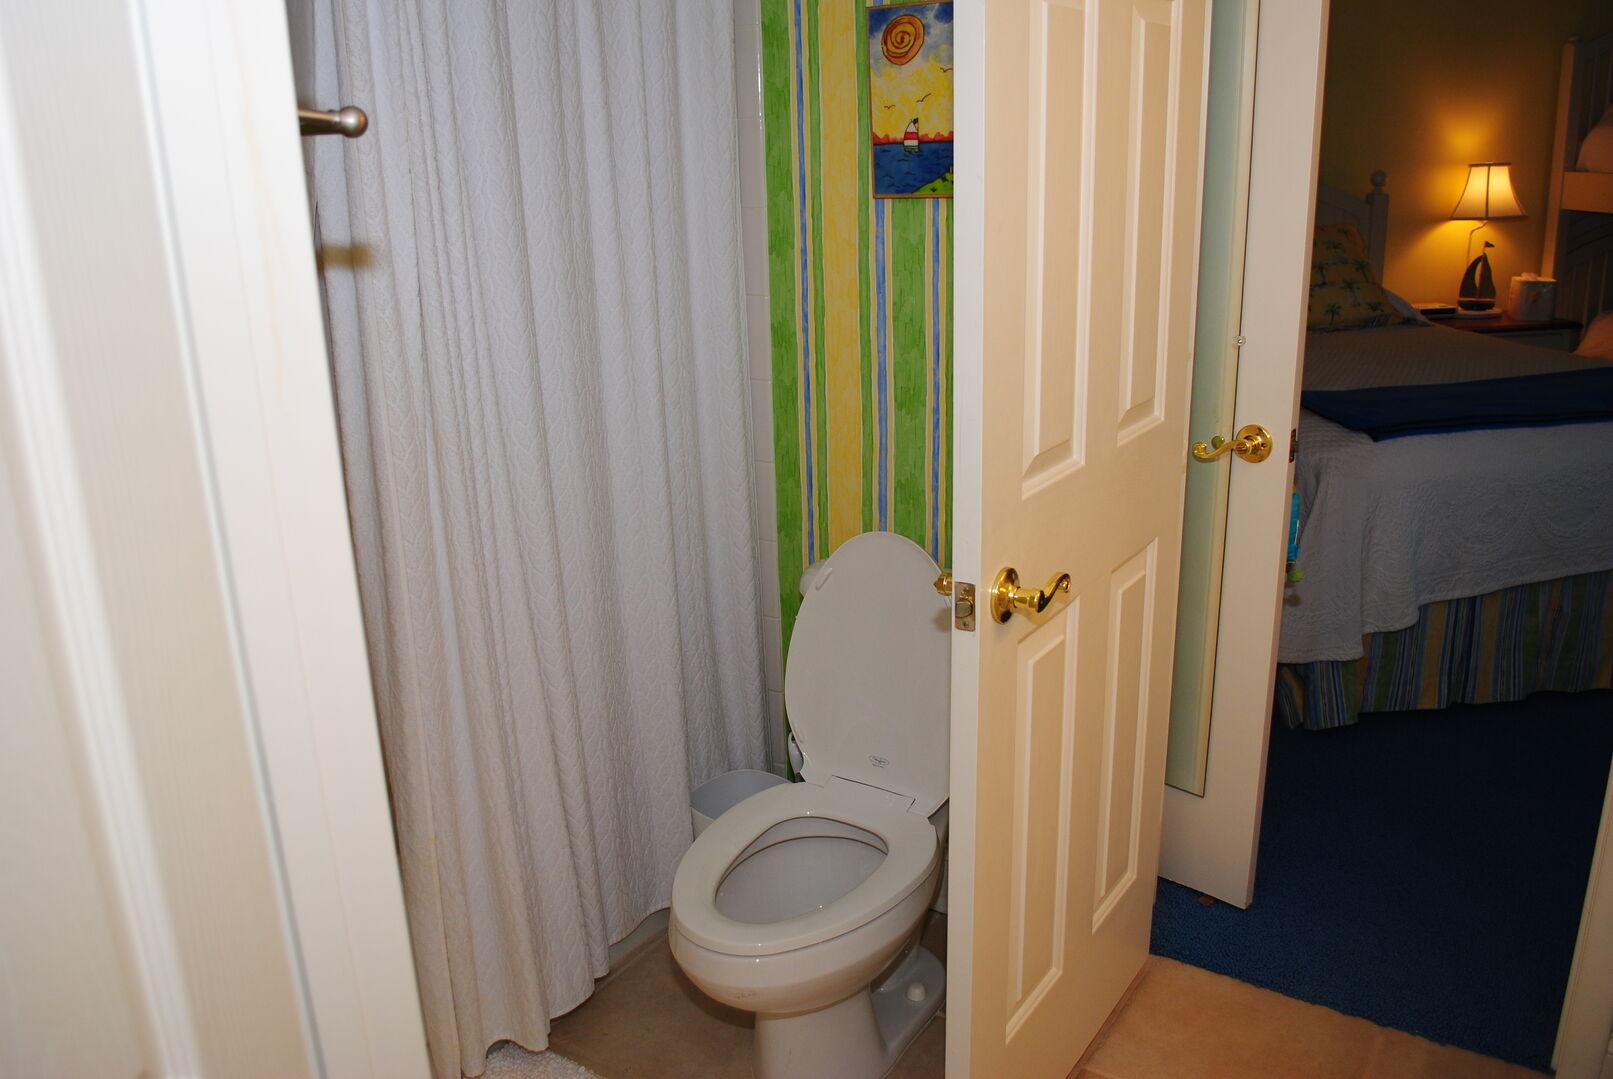 Shared Bathroom (Queen/Bunk and Hallway)